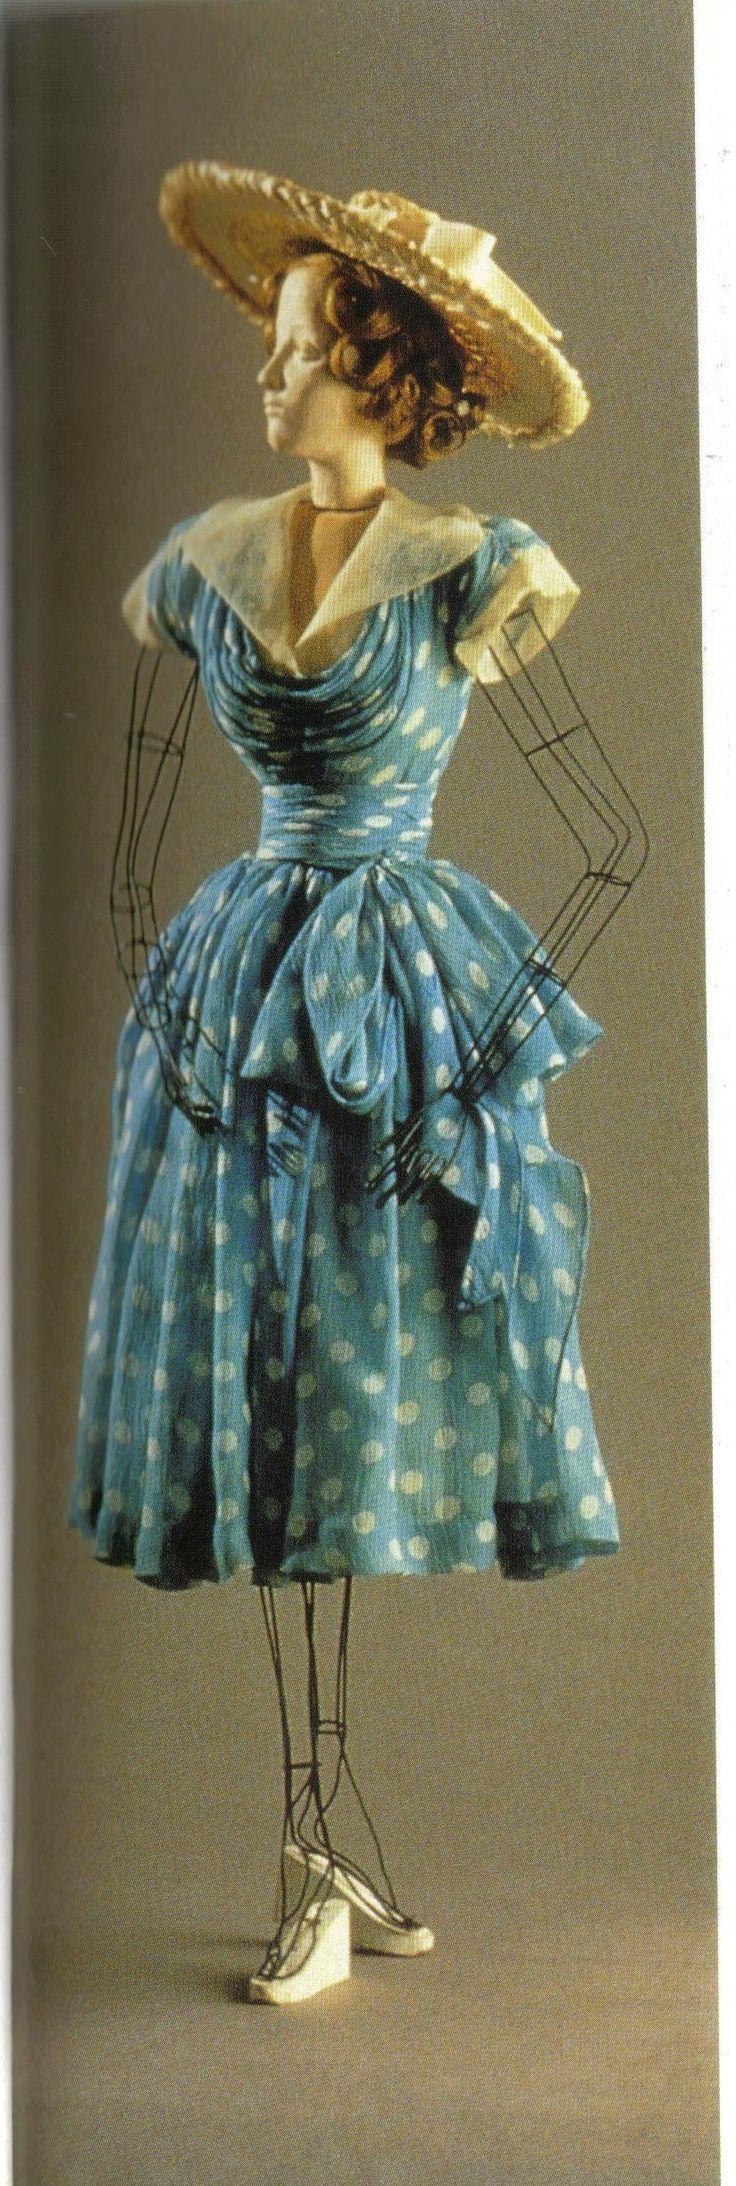 1945 Lucien Lelong blue dress. (Interesting mannequin.)